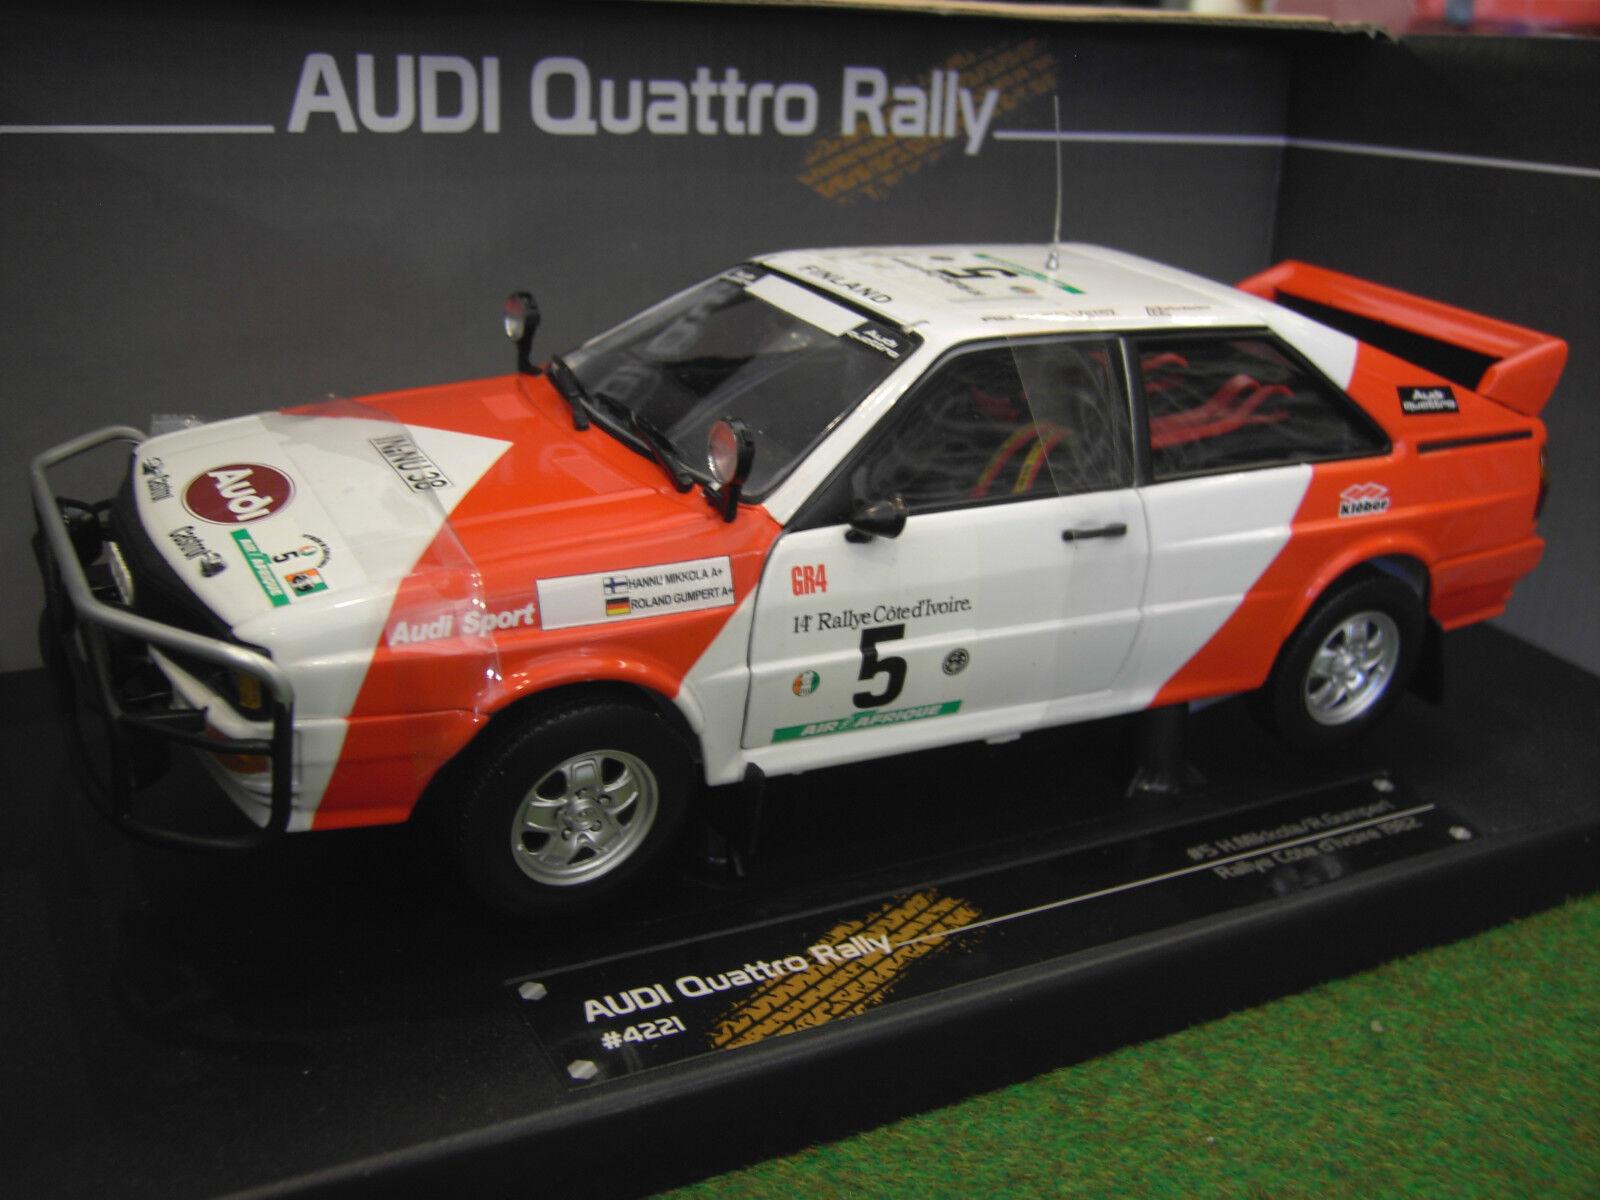 AUDI QUATTRO RALLY CÔTE D'IVOIRE  5 1982 RALLYE 1 18 SUNSTAR 4221 voiture miniat